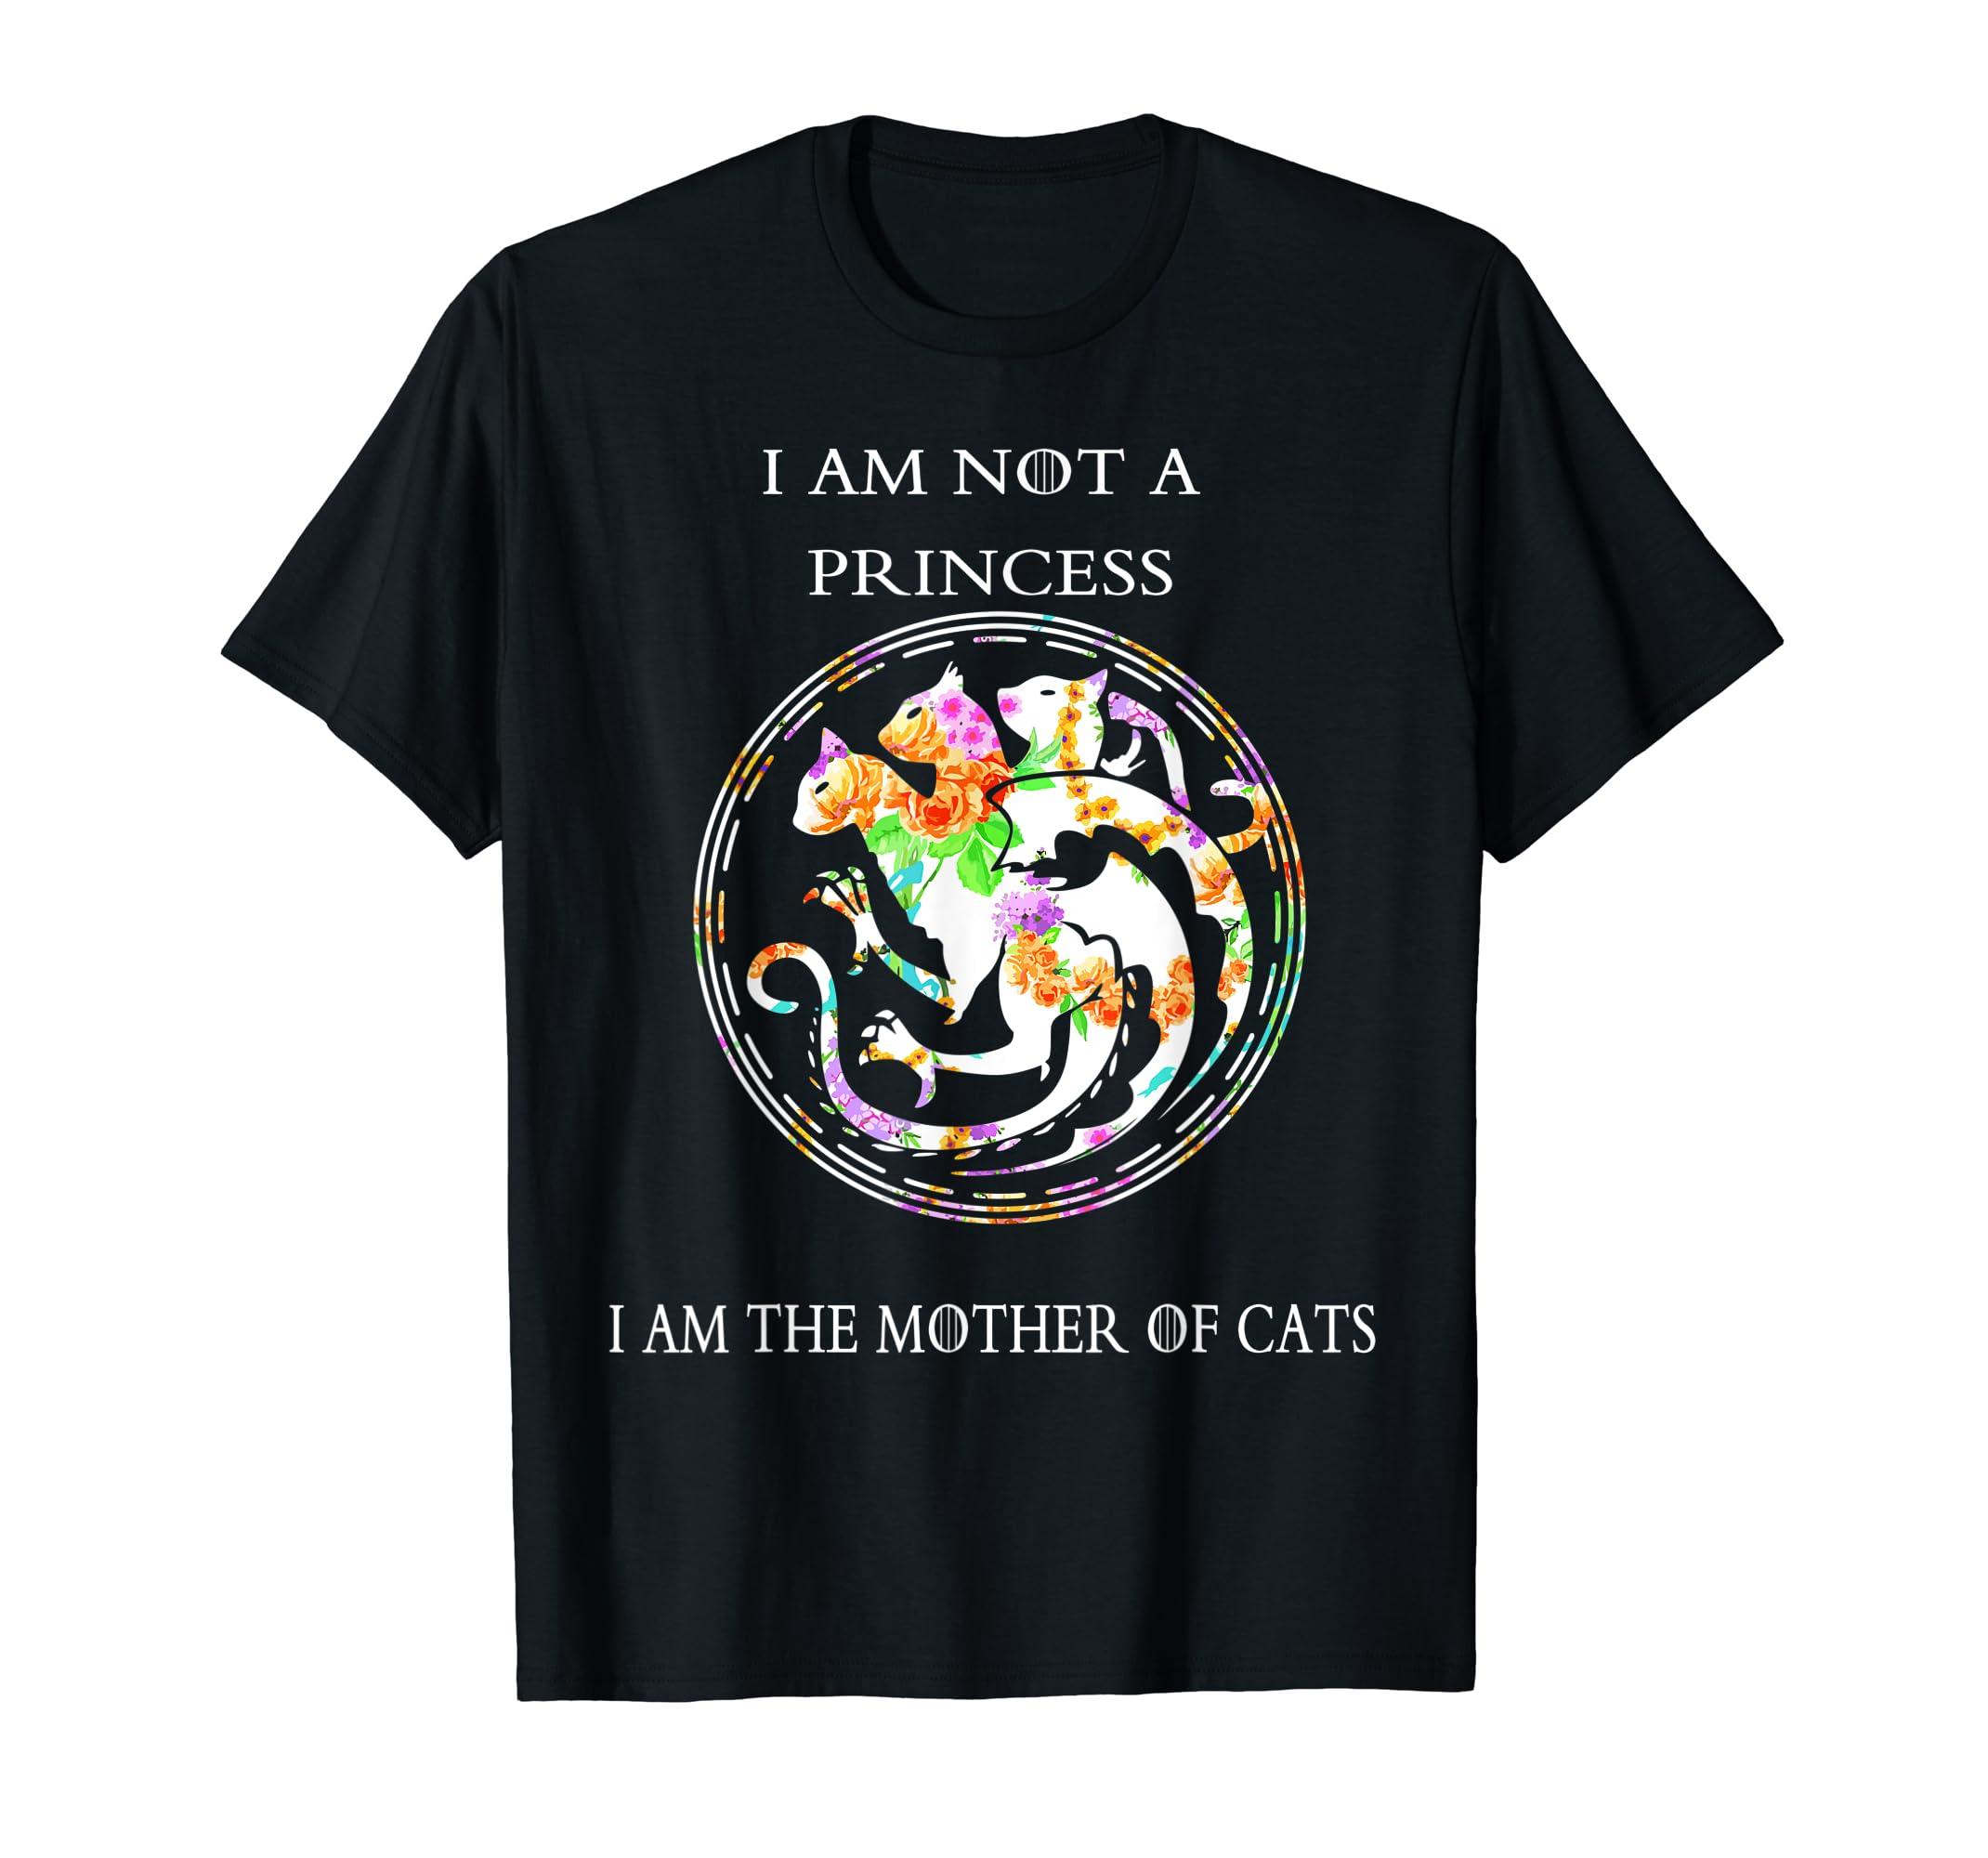 Funny T Shirt Floral Mother of Cats Tshirt for Women Men-Men's T-Shirt-Black